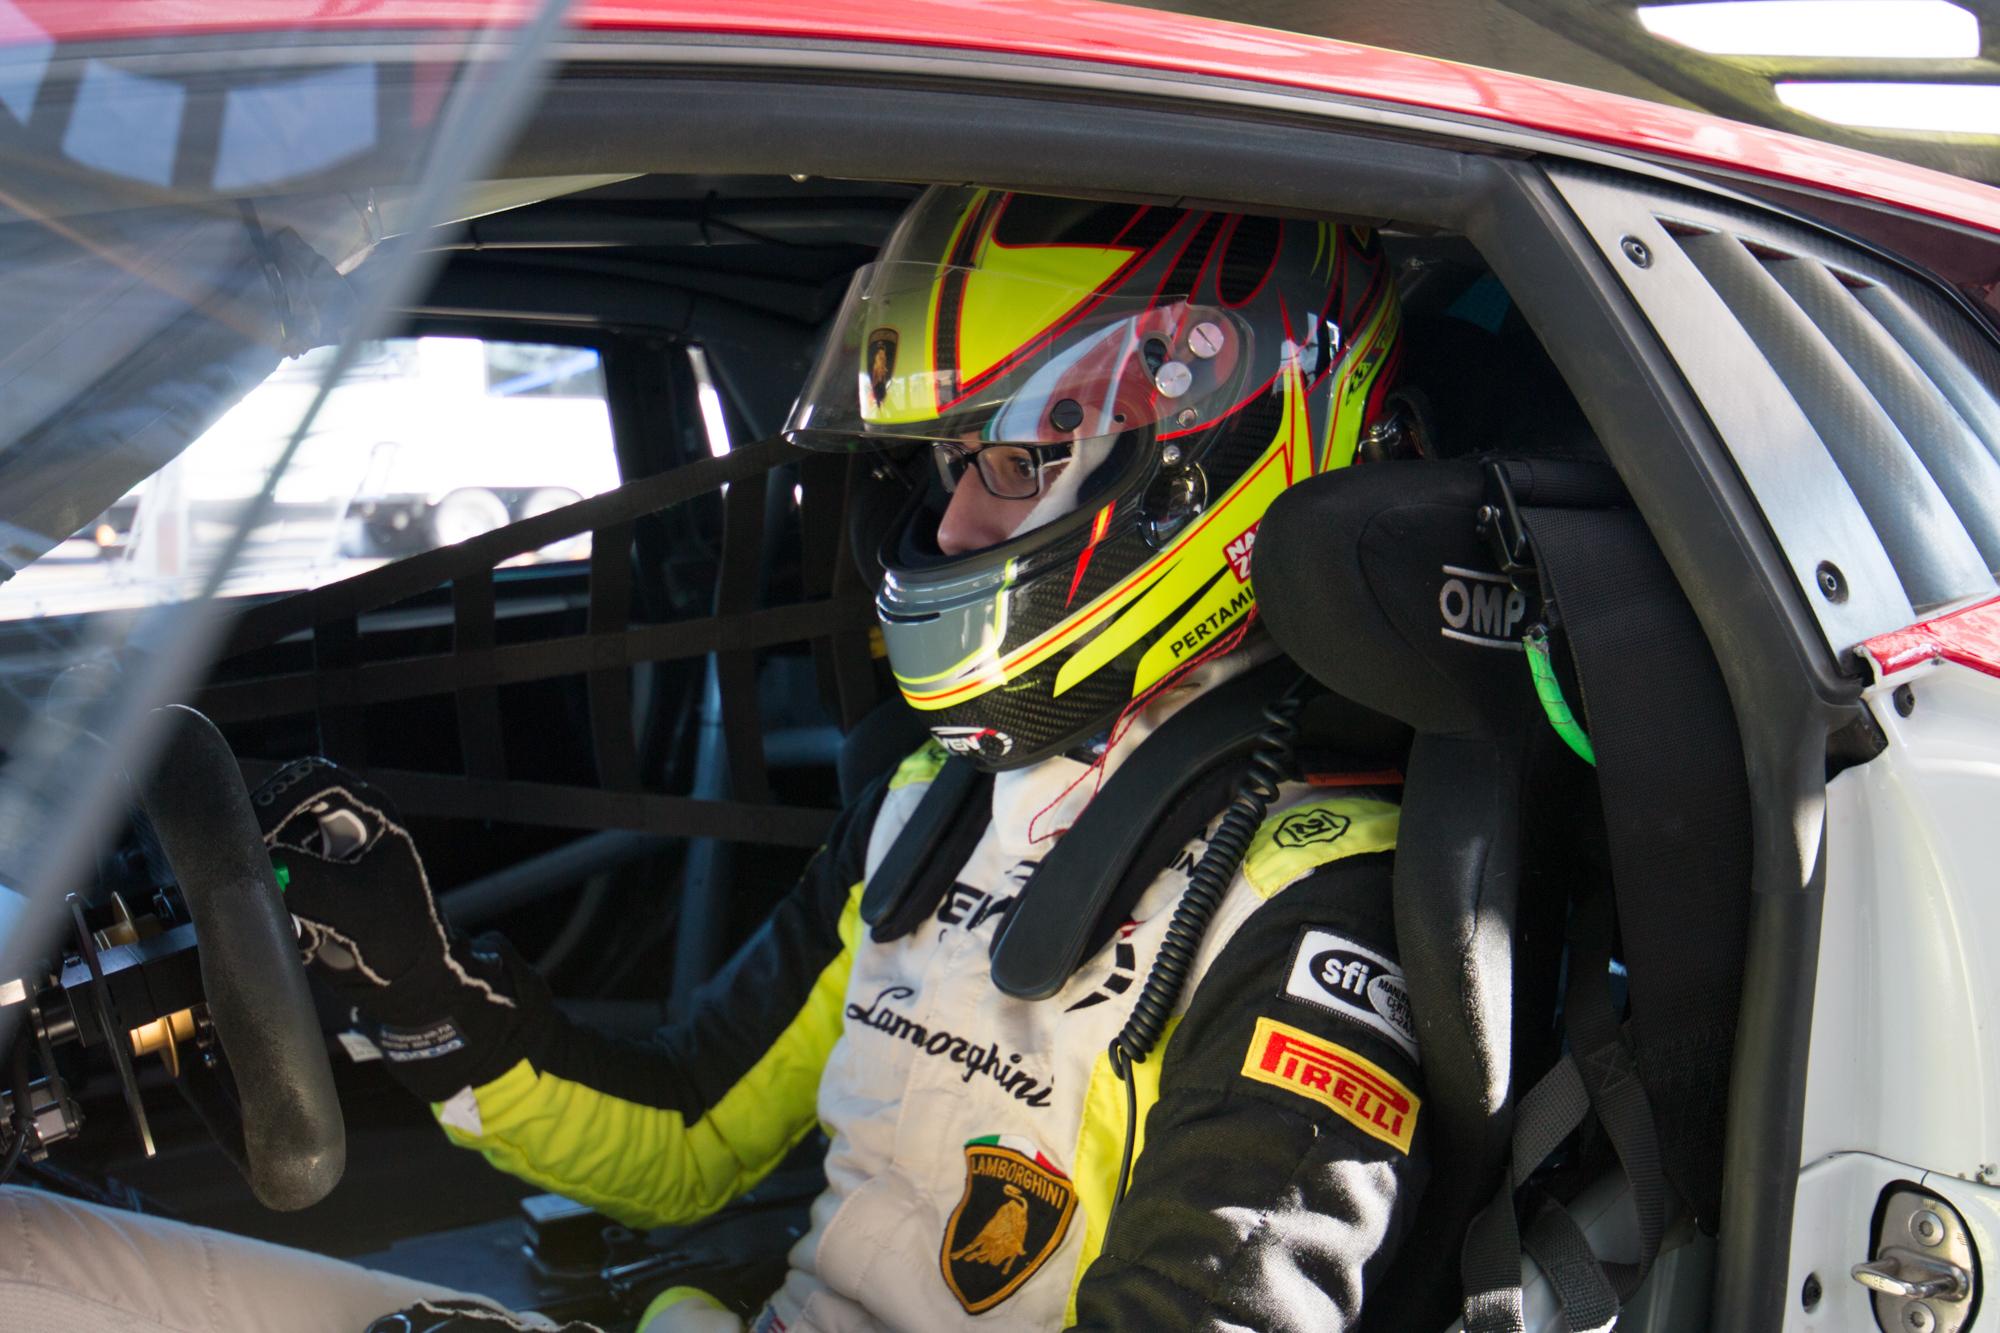 Steven-Racing-20130204-44720.jpg